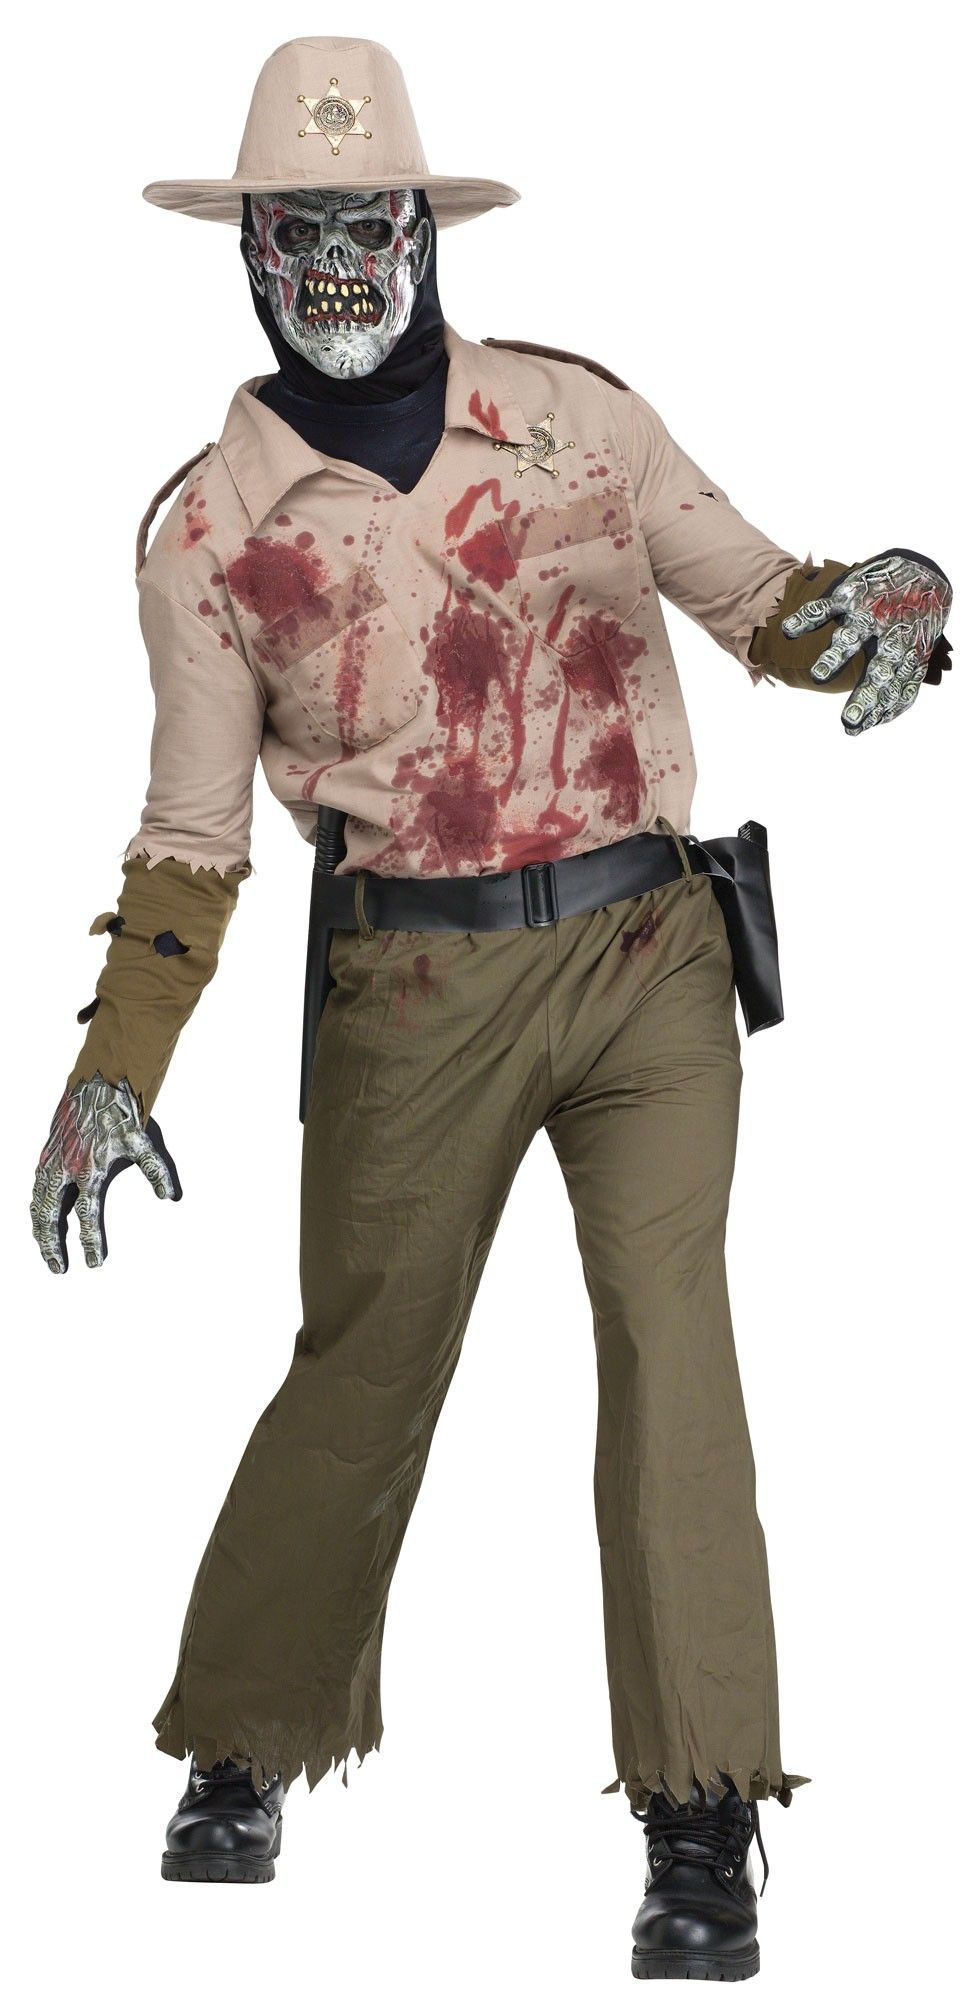 Zombie Sheriff by Fun World  sc 1 st  Pinterest & Zombie Sheriff by Fun World | Scary Costumes | Pinterest | Sheriff ...